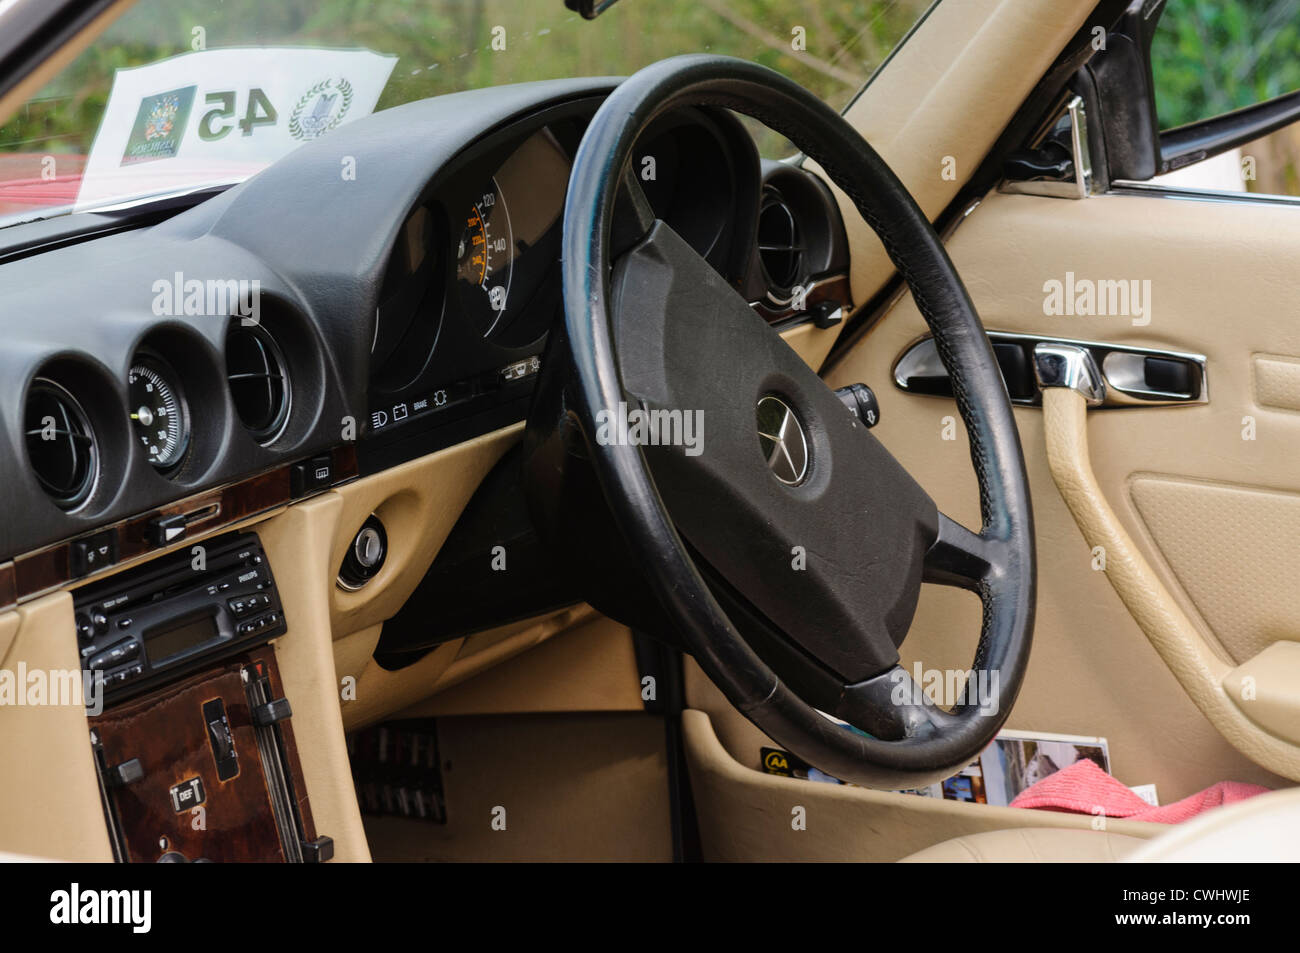 dashboard steering wheel mercedes benz stockfotos. Black Bedroom Furniture Sets. Home Design Ideas